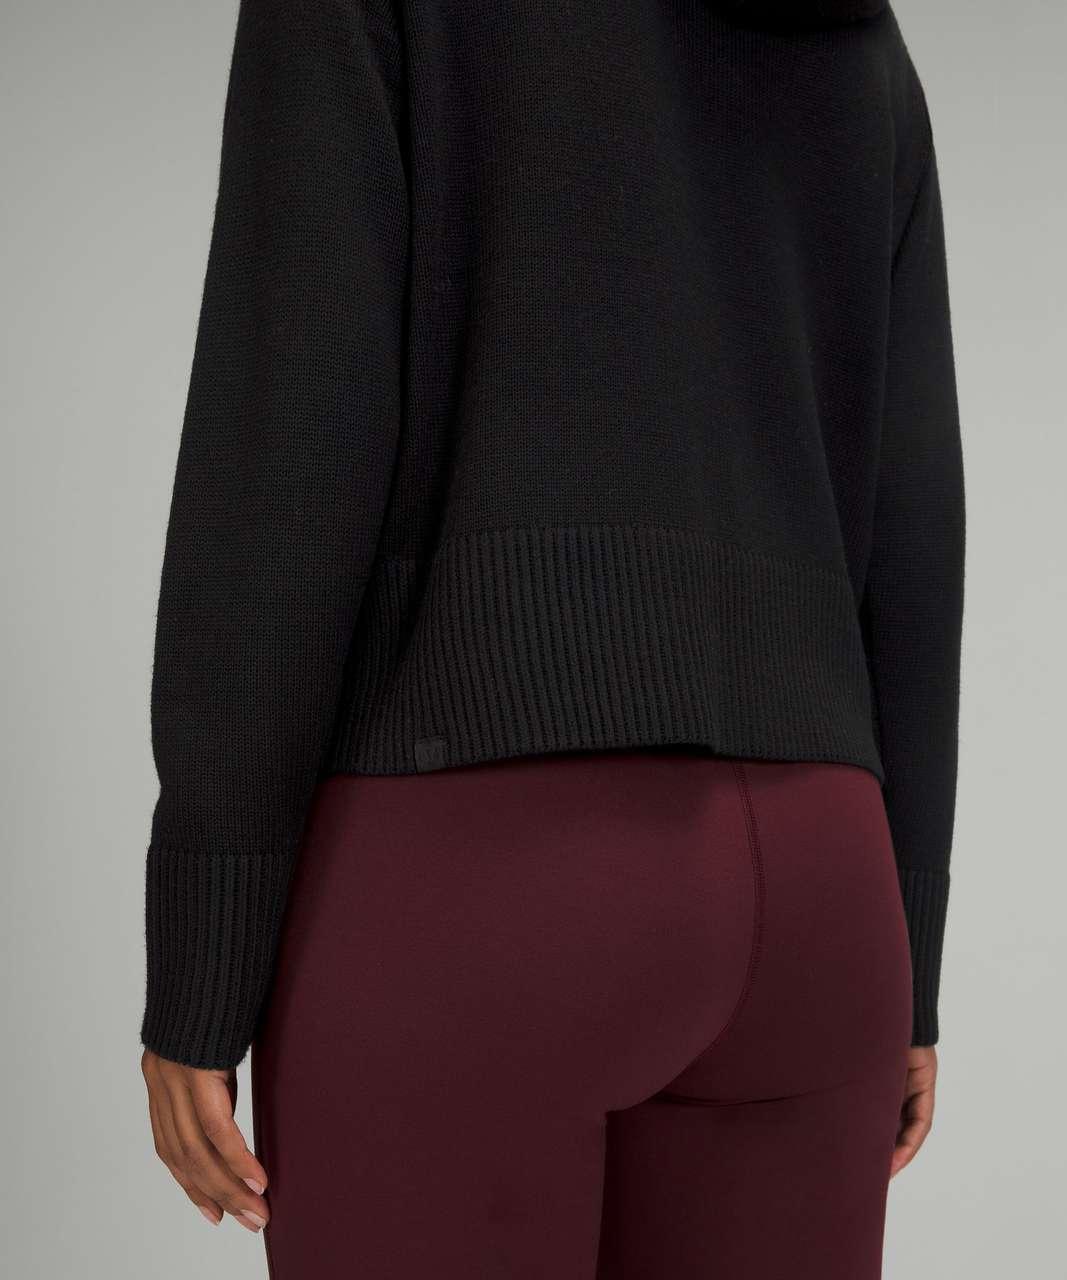 Lululemon Double Knit Sweater Hoodie - Black